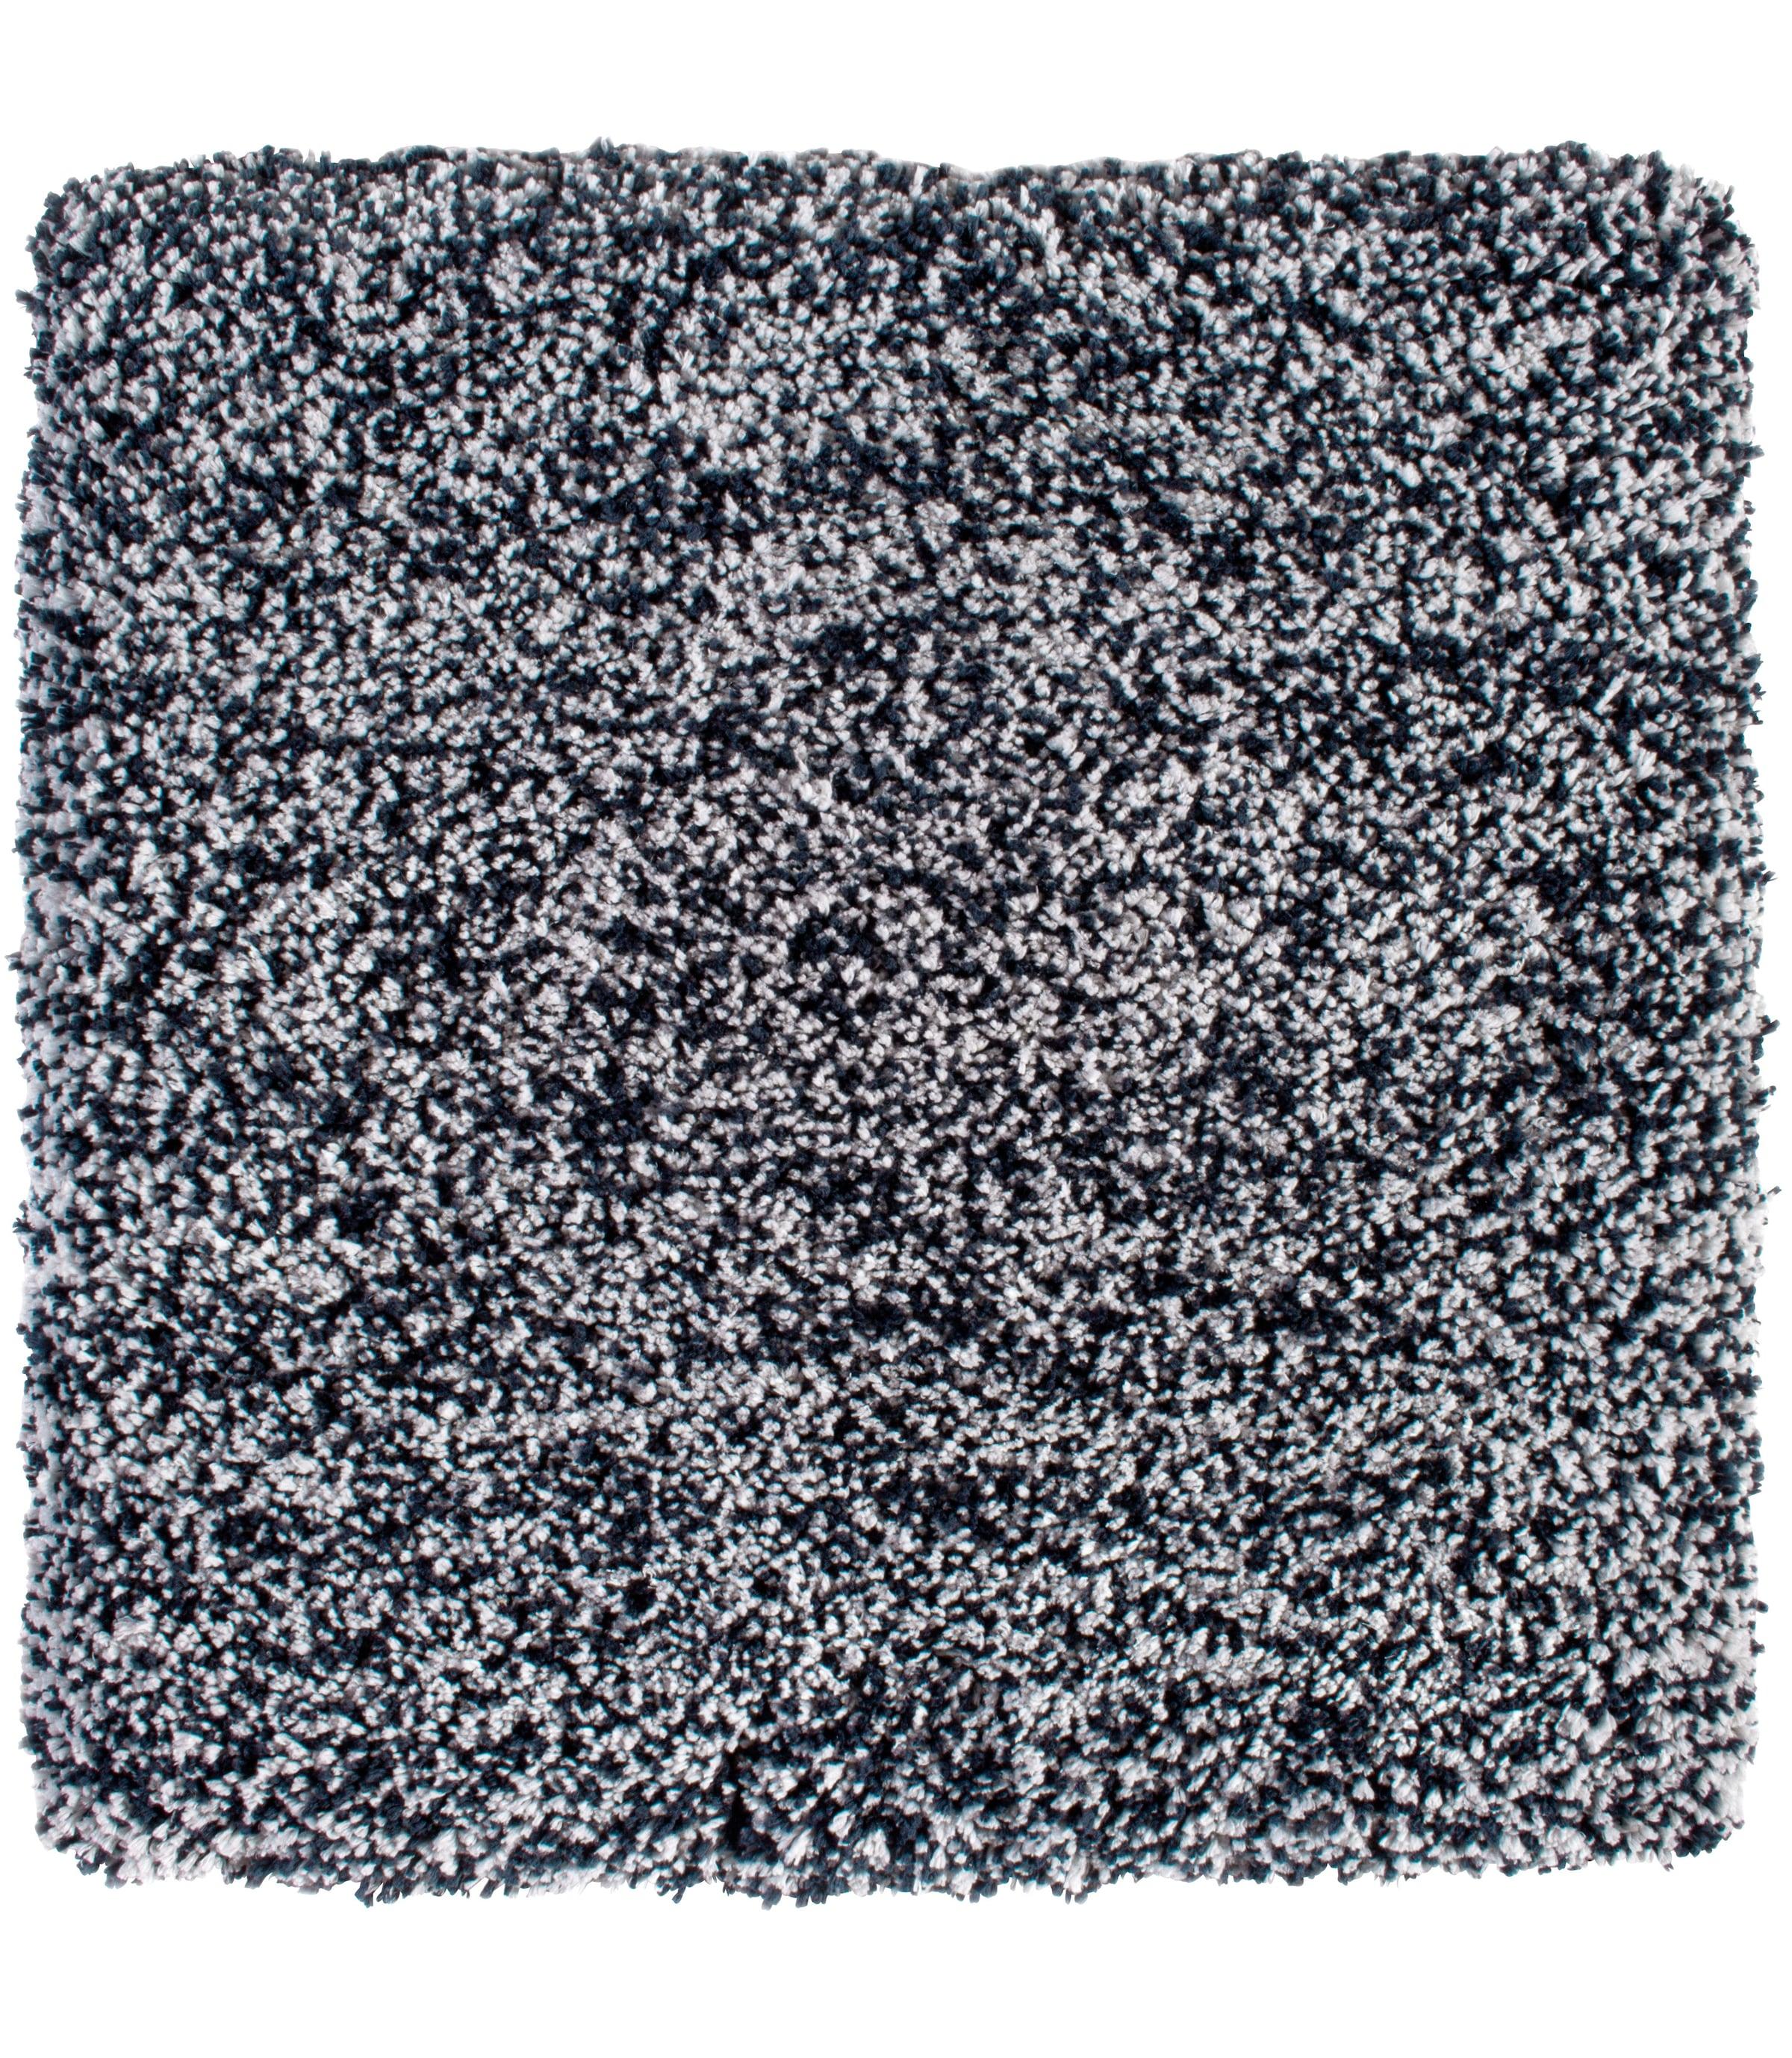 Image of Al MANO Teppichfliese »Piazza«, 8x 40x40 cm